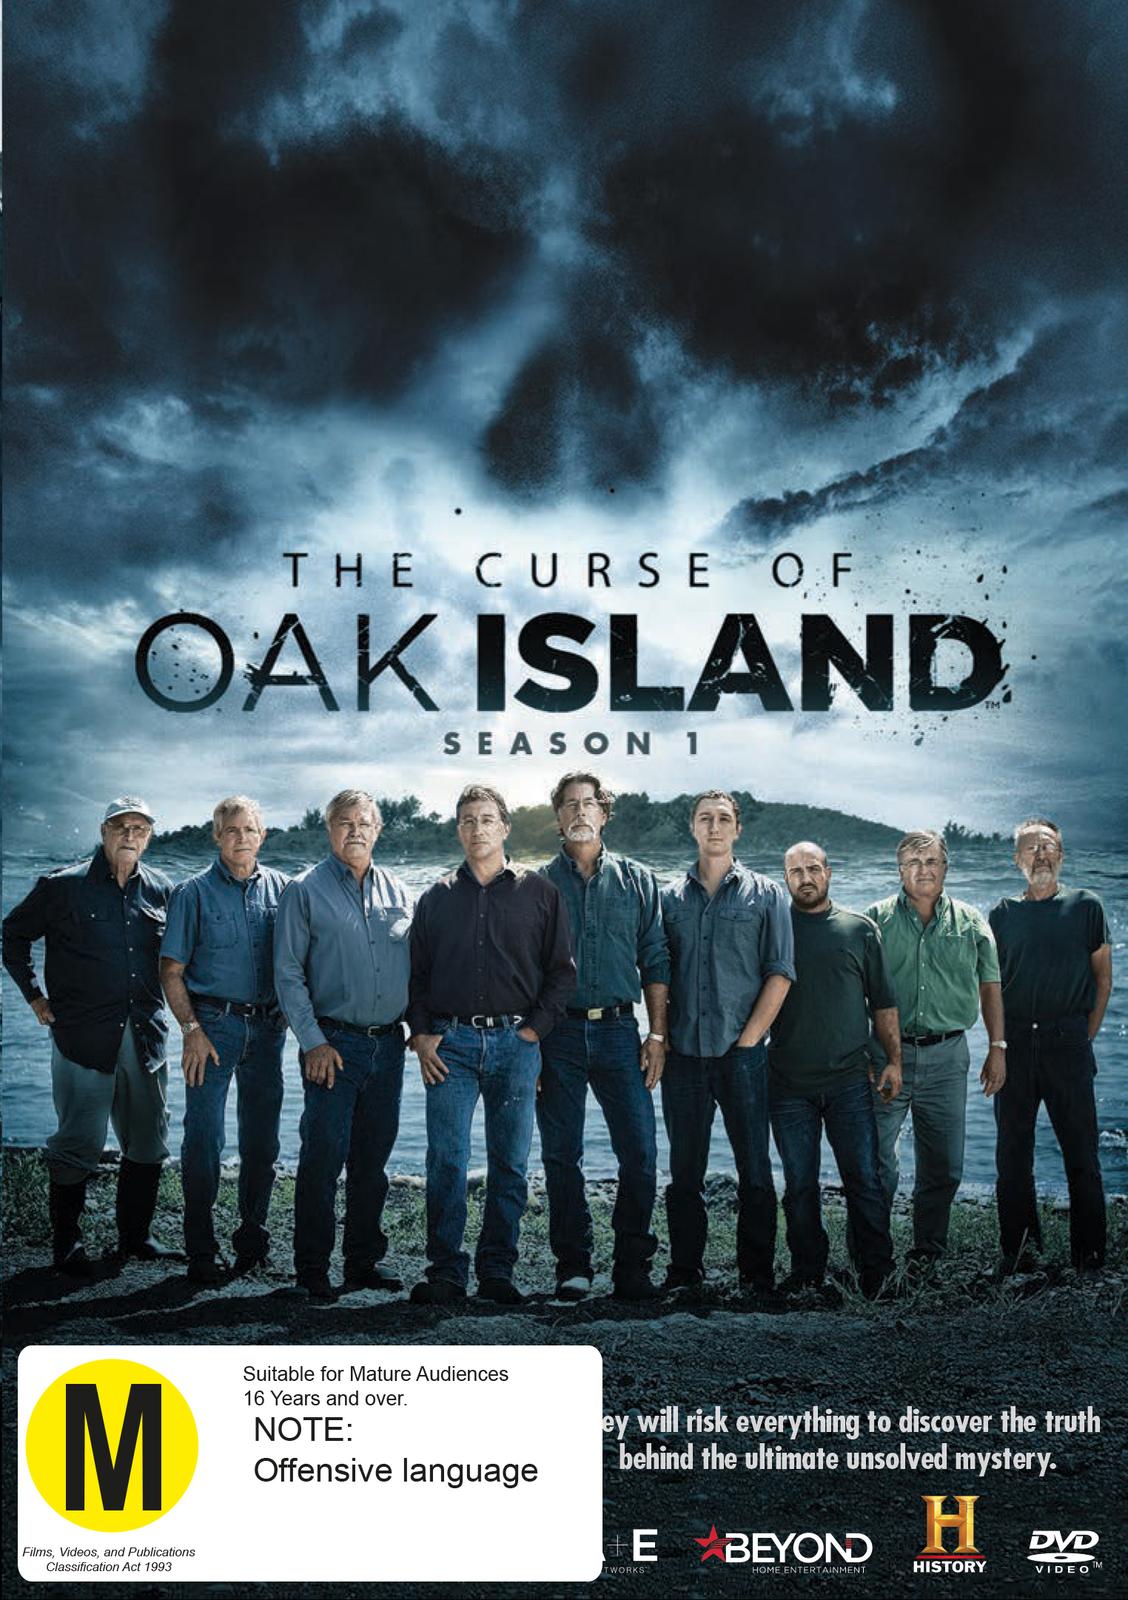 The Curse of Oak Island - Season 1 on DVD image